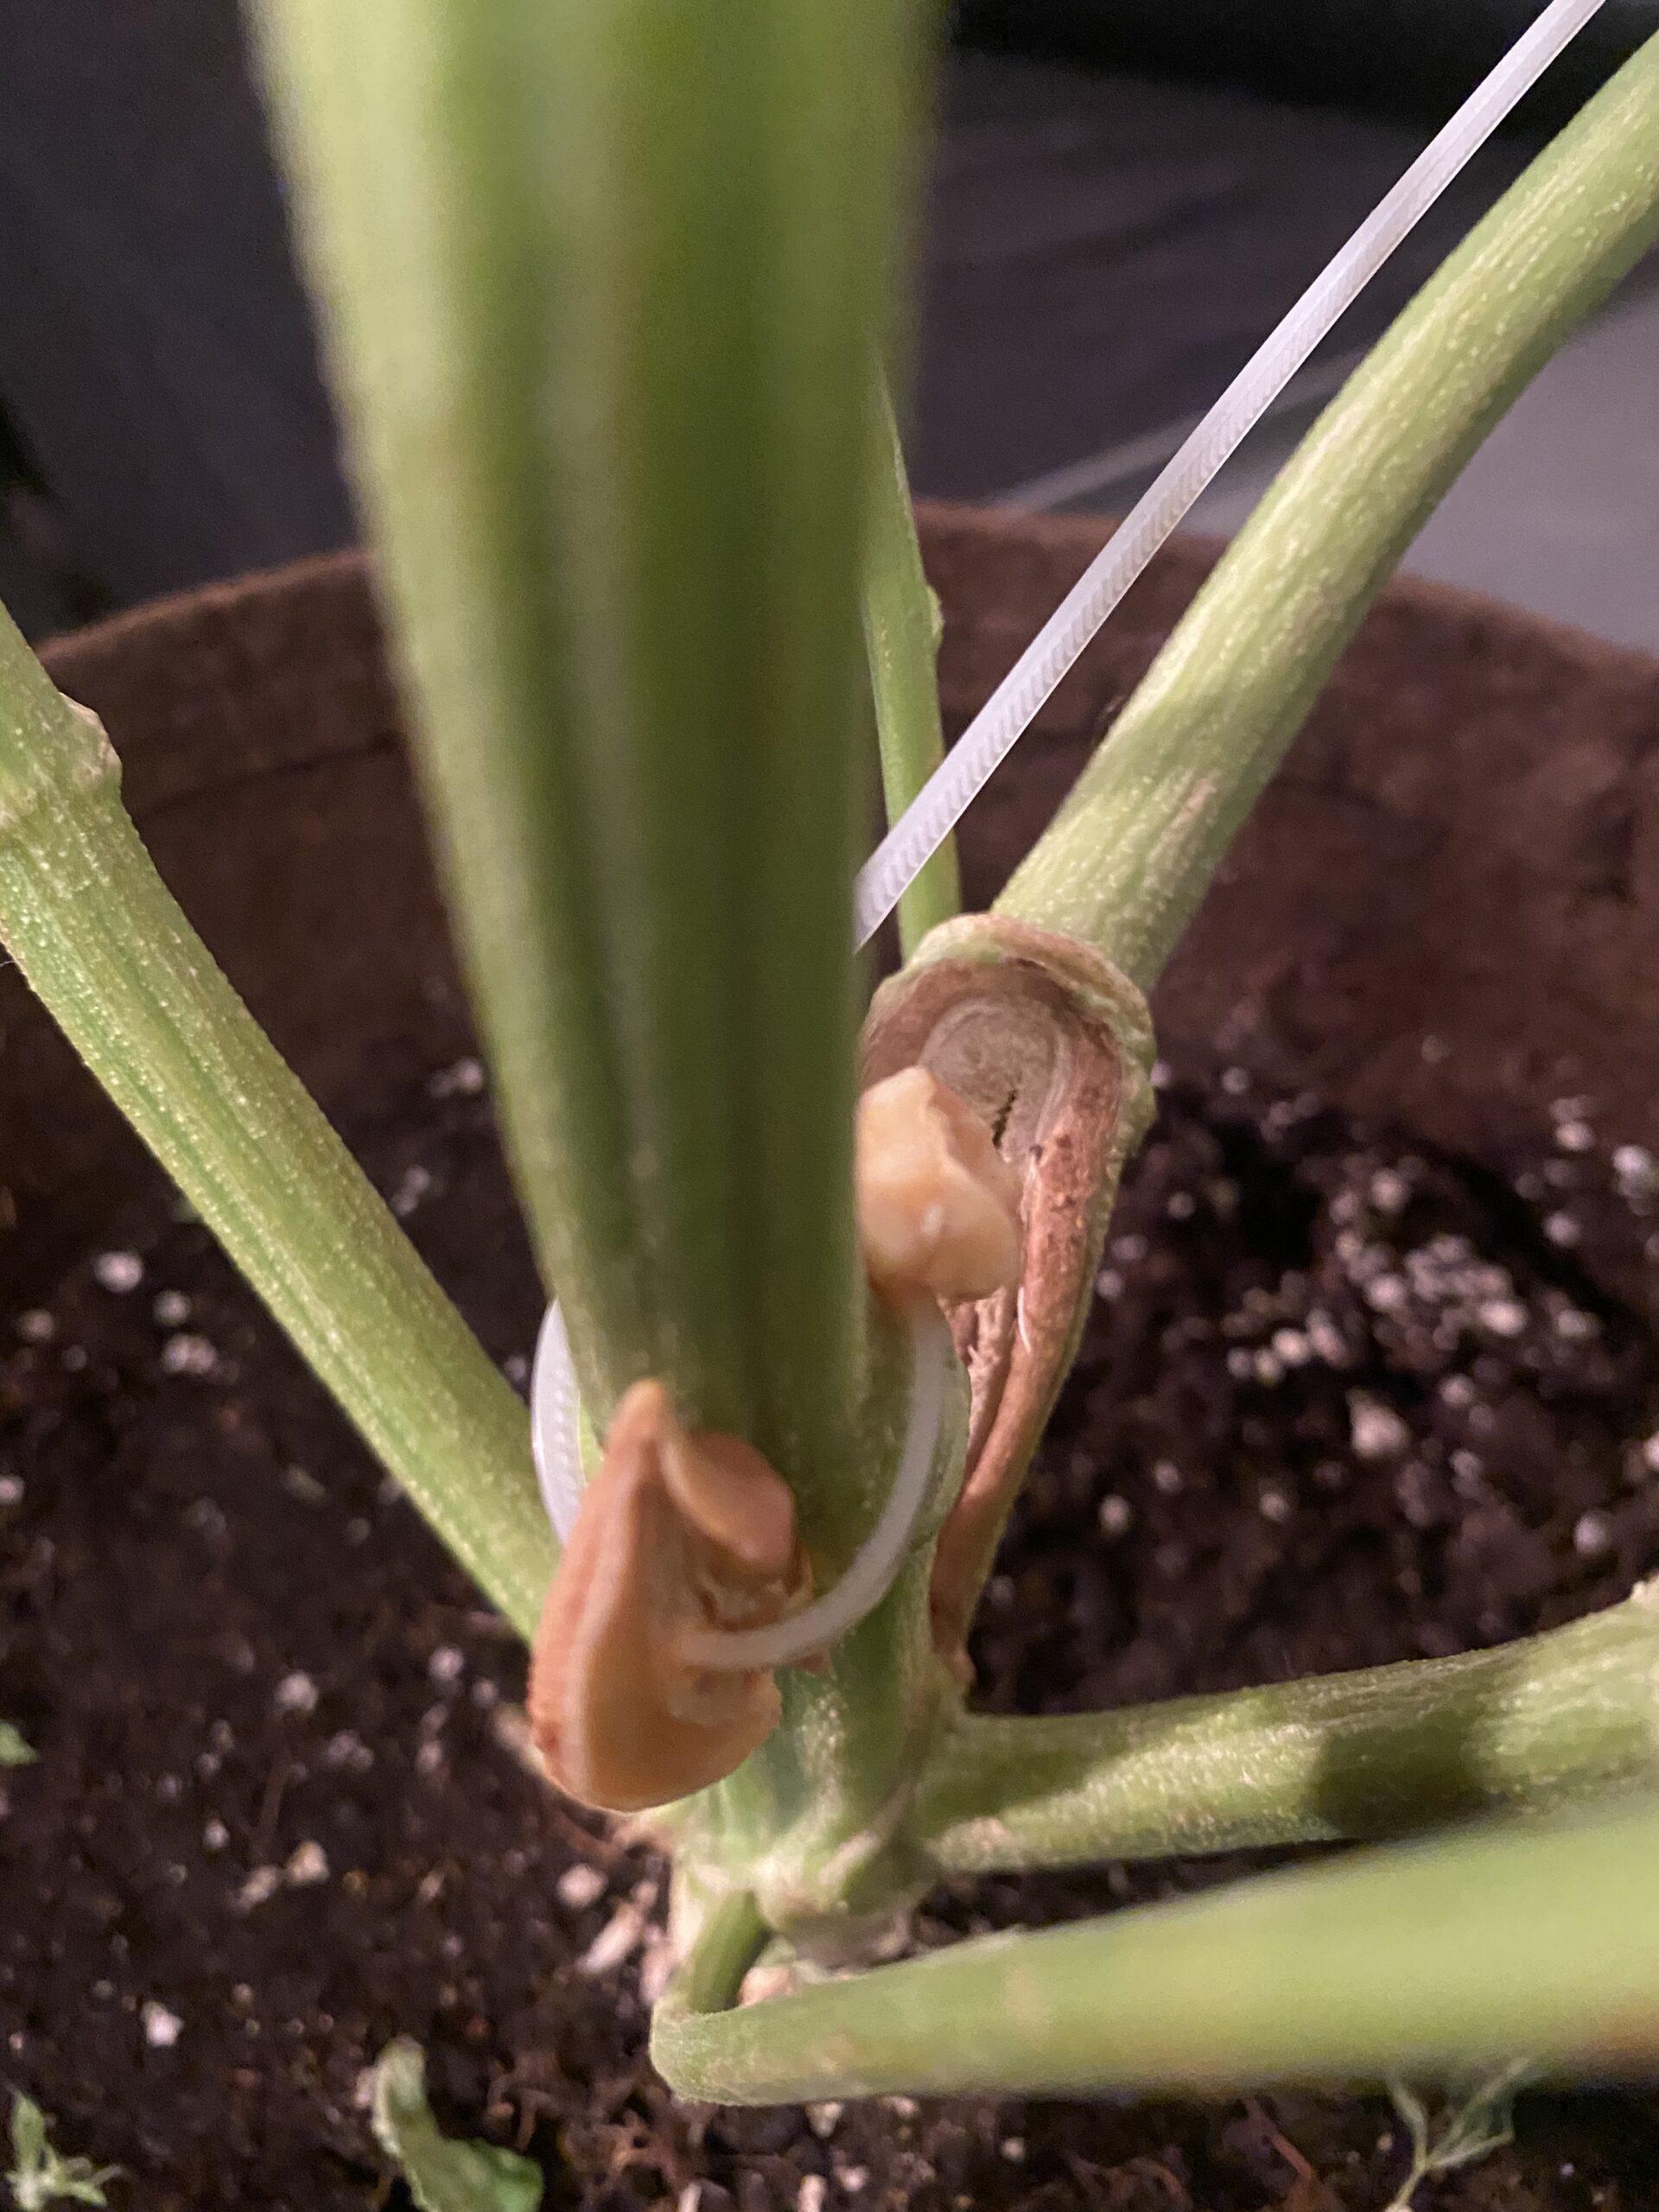 garlic and cannabis